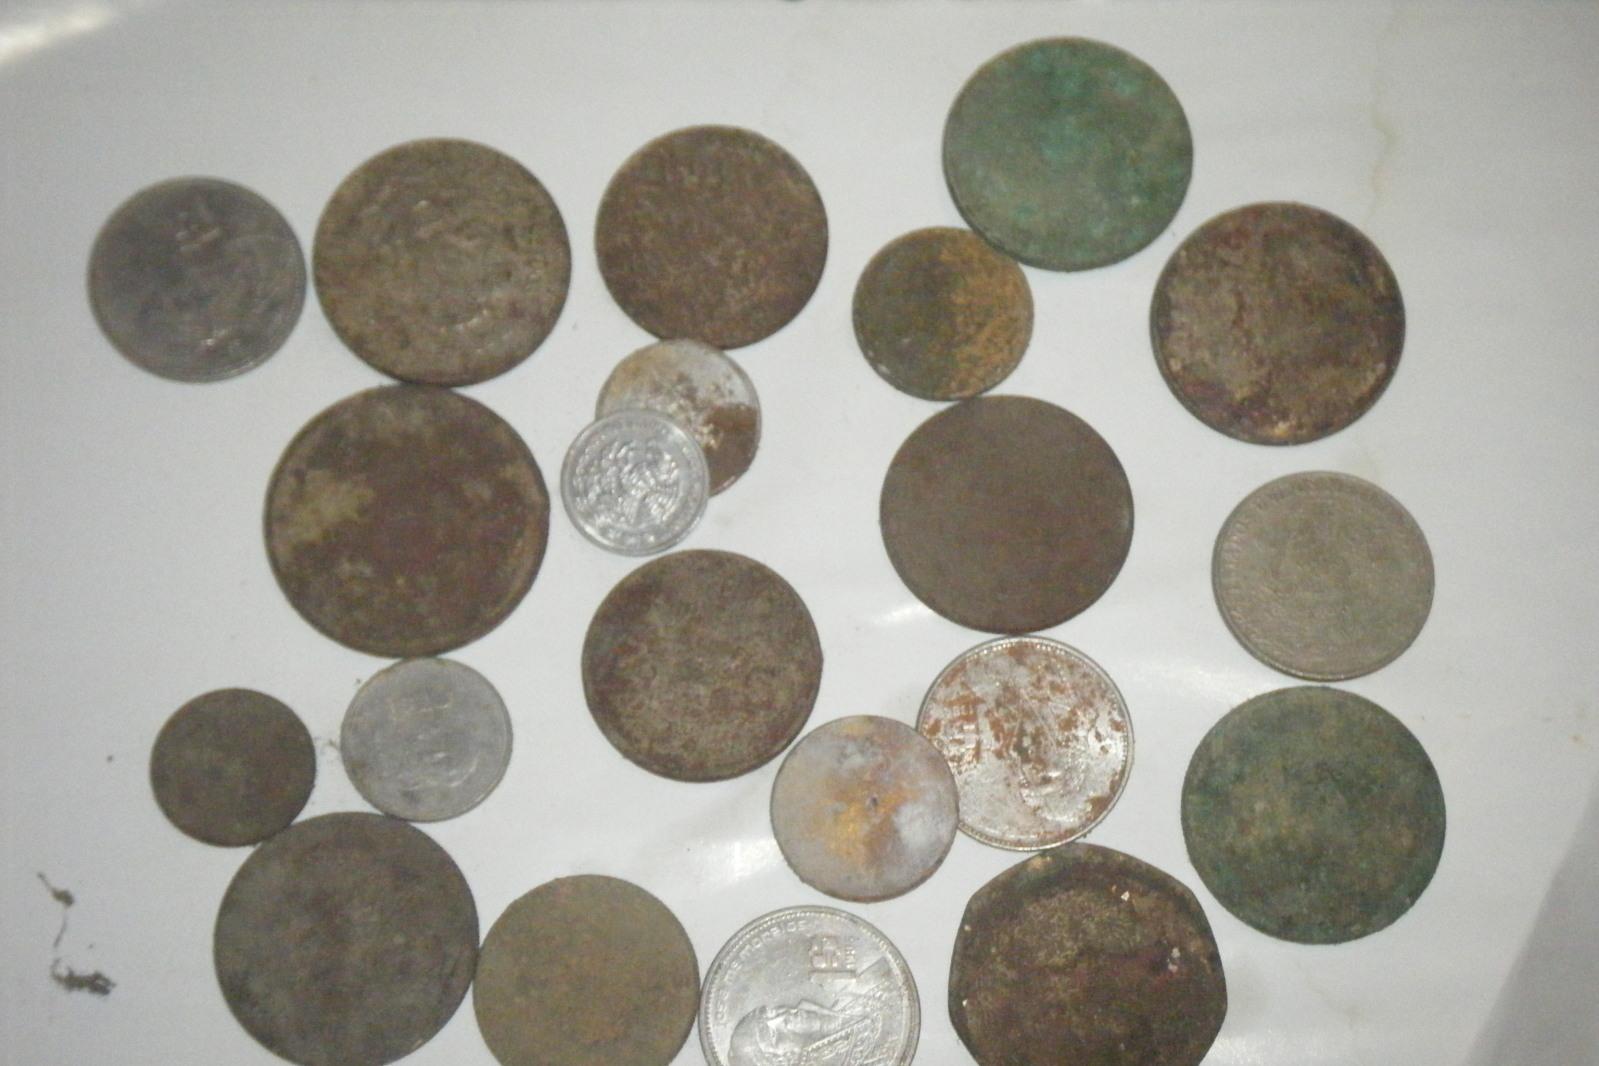 monedas encontradas en casa antigua.....    Wui0r8